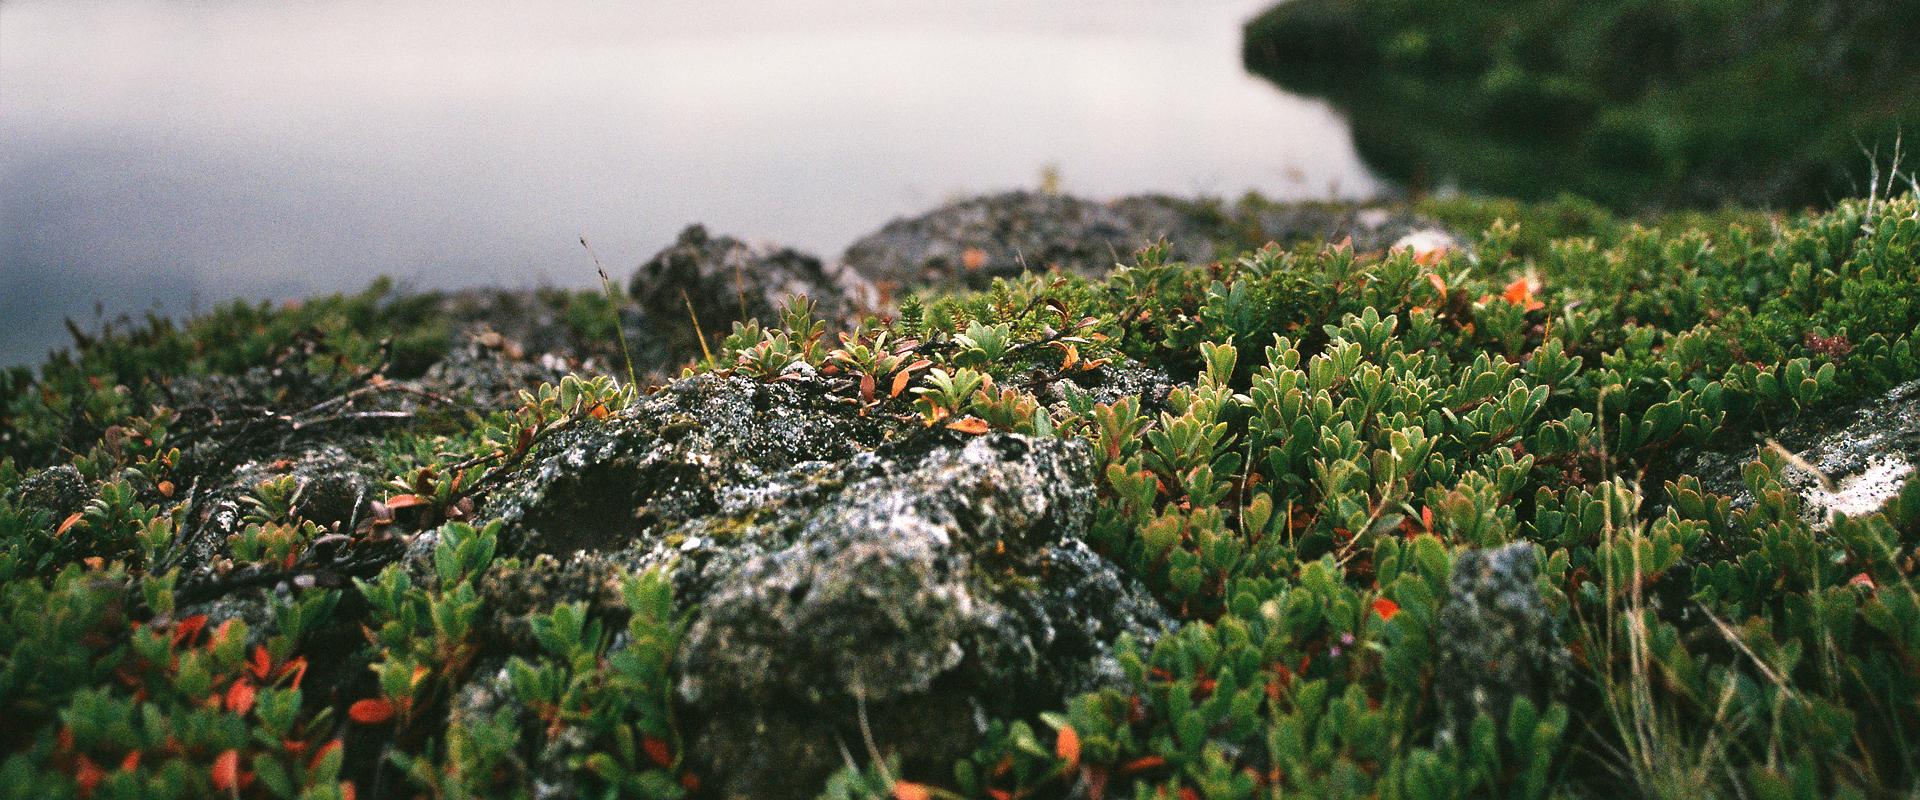 islande-hello-adventures-87-kalfastrond-ae1-wide